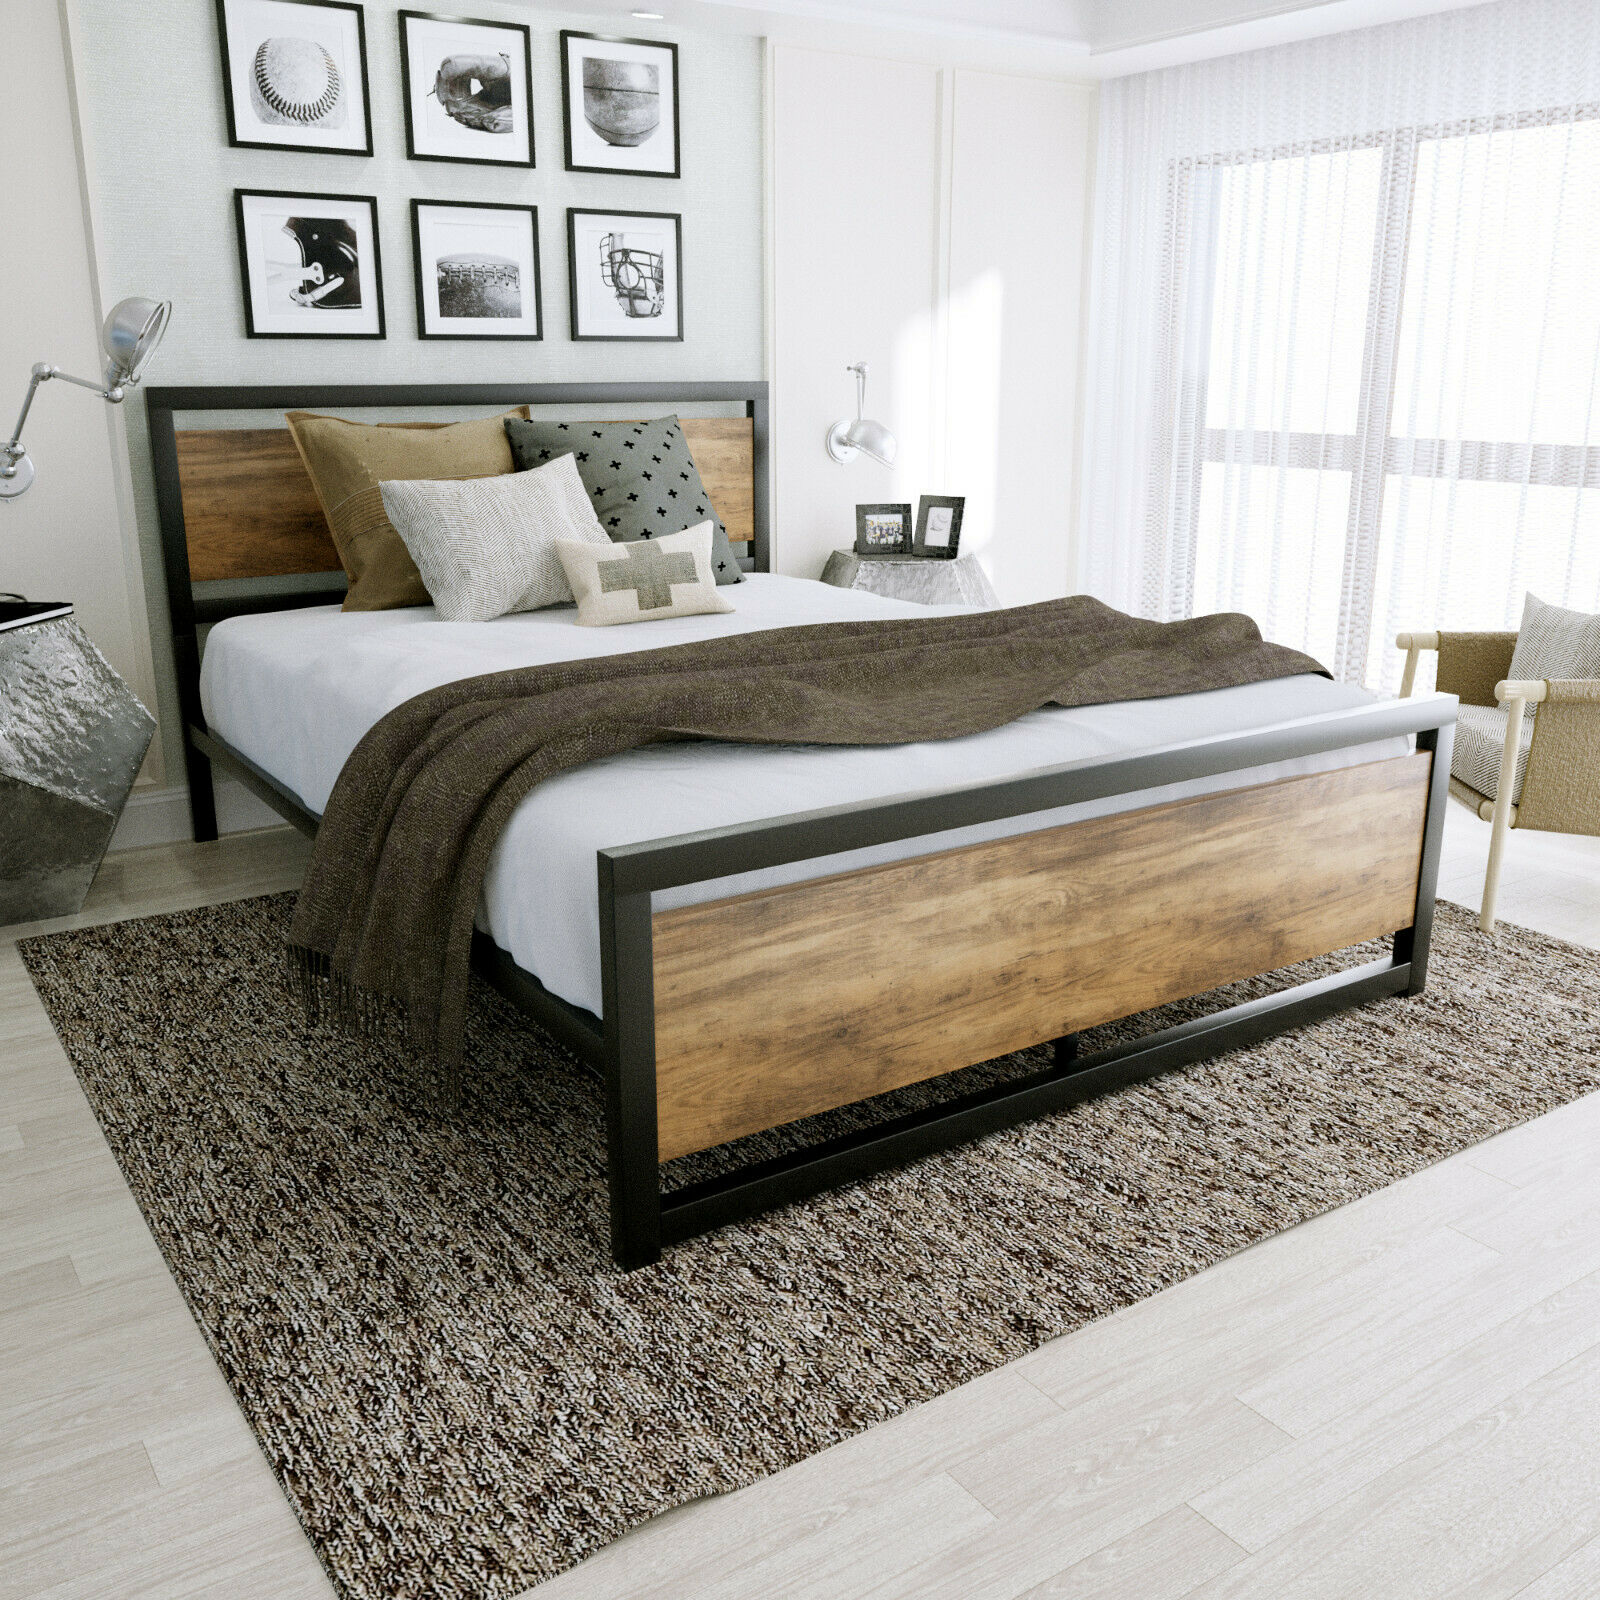 Platform Bed Queen With Headboard Rustic Vintage Reclaimed Wood